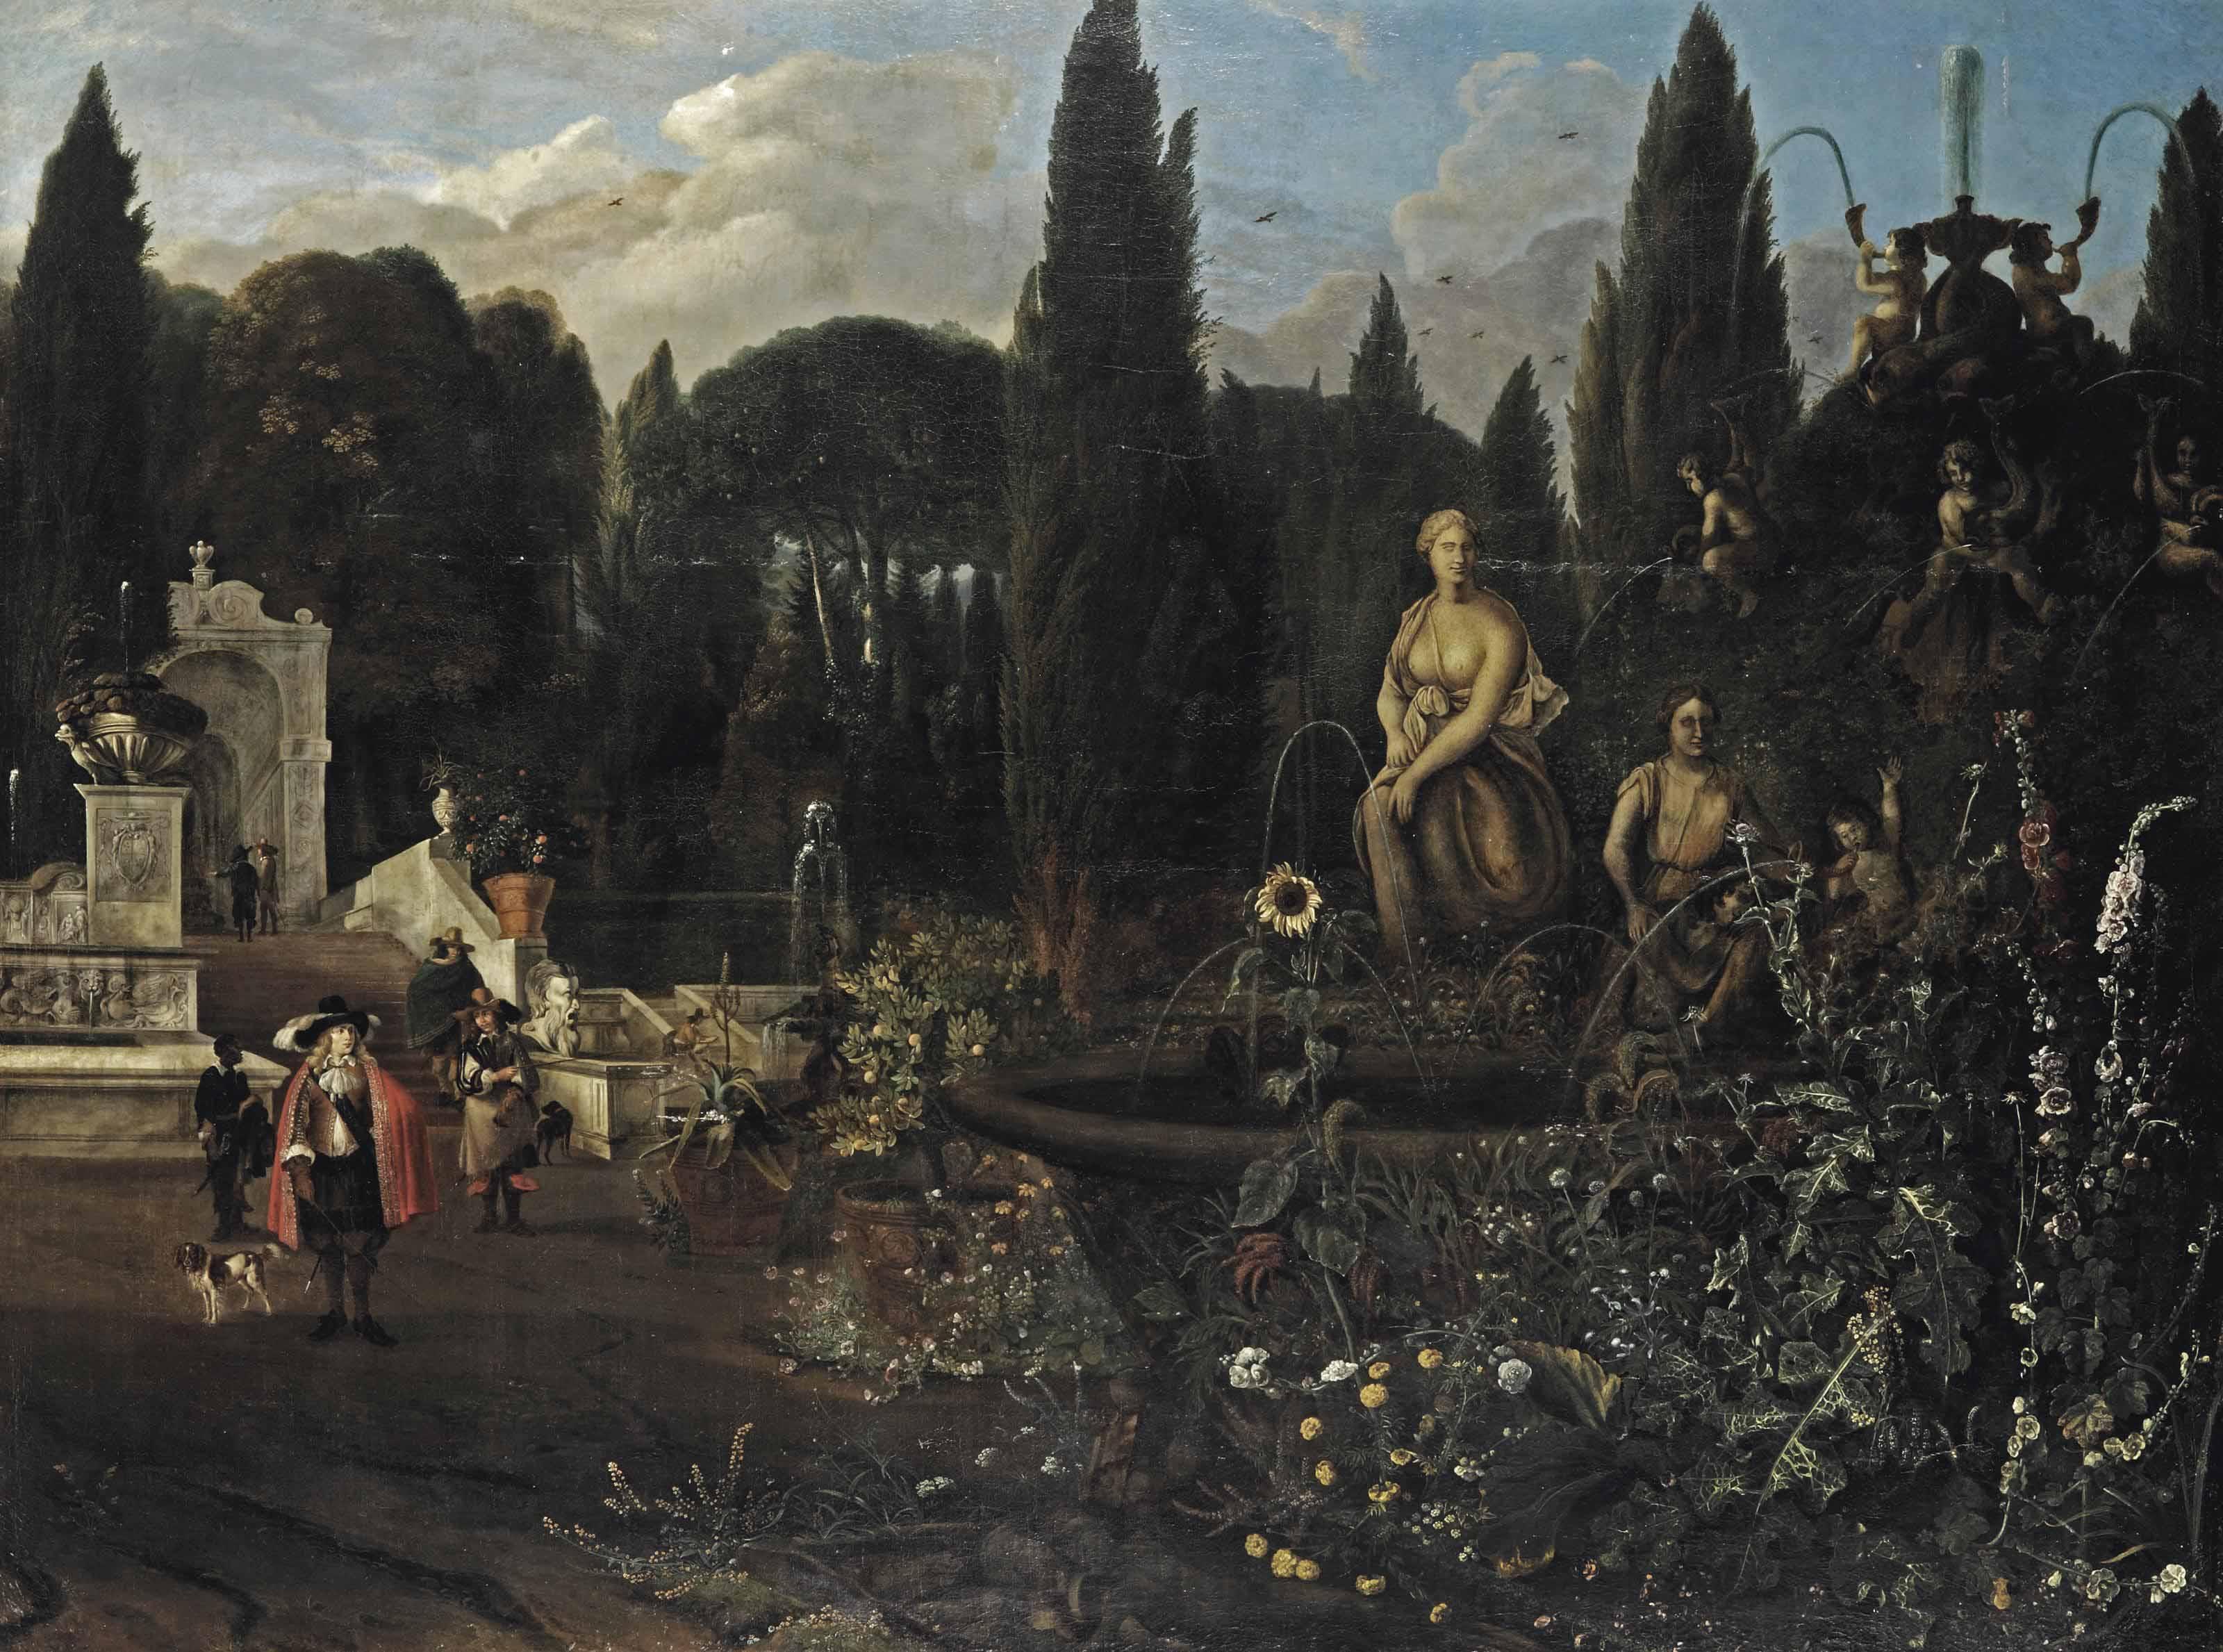 The Farnese Gardens, Rome